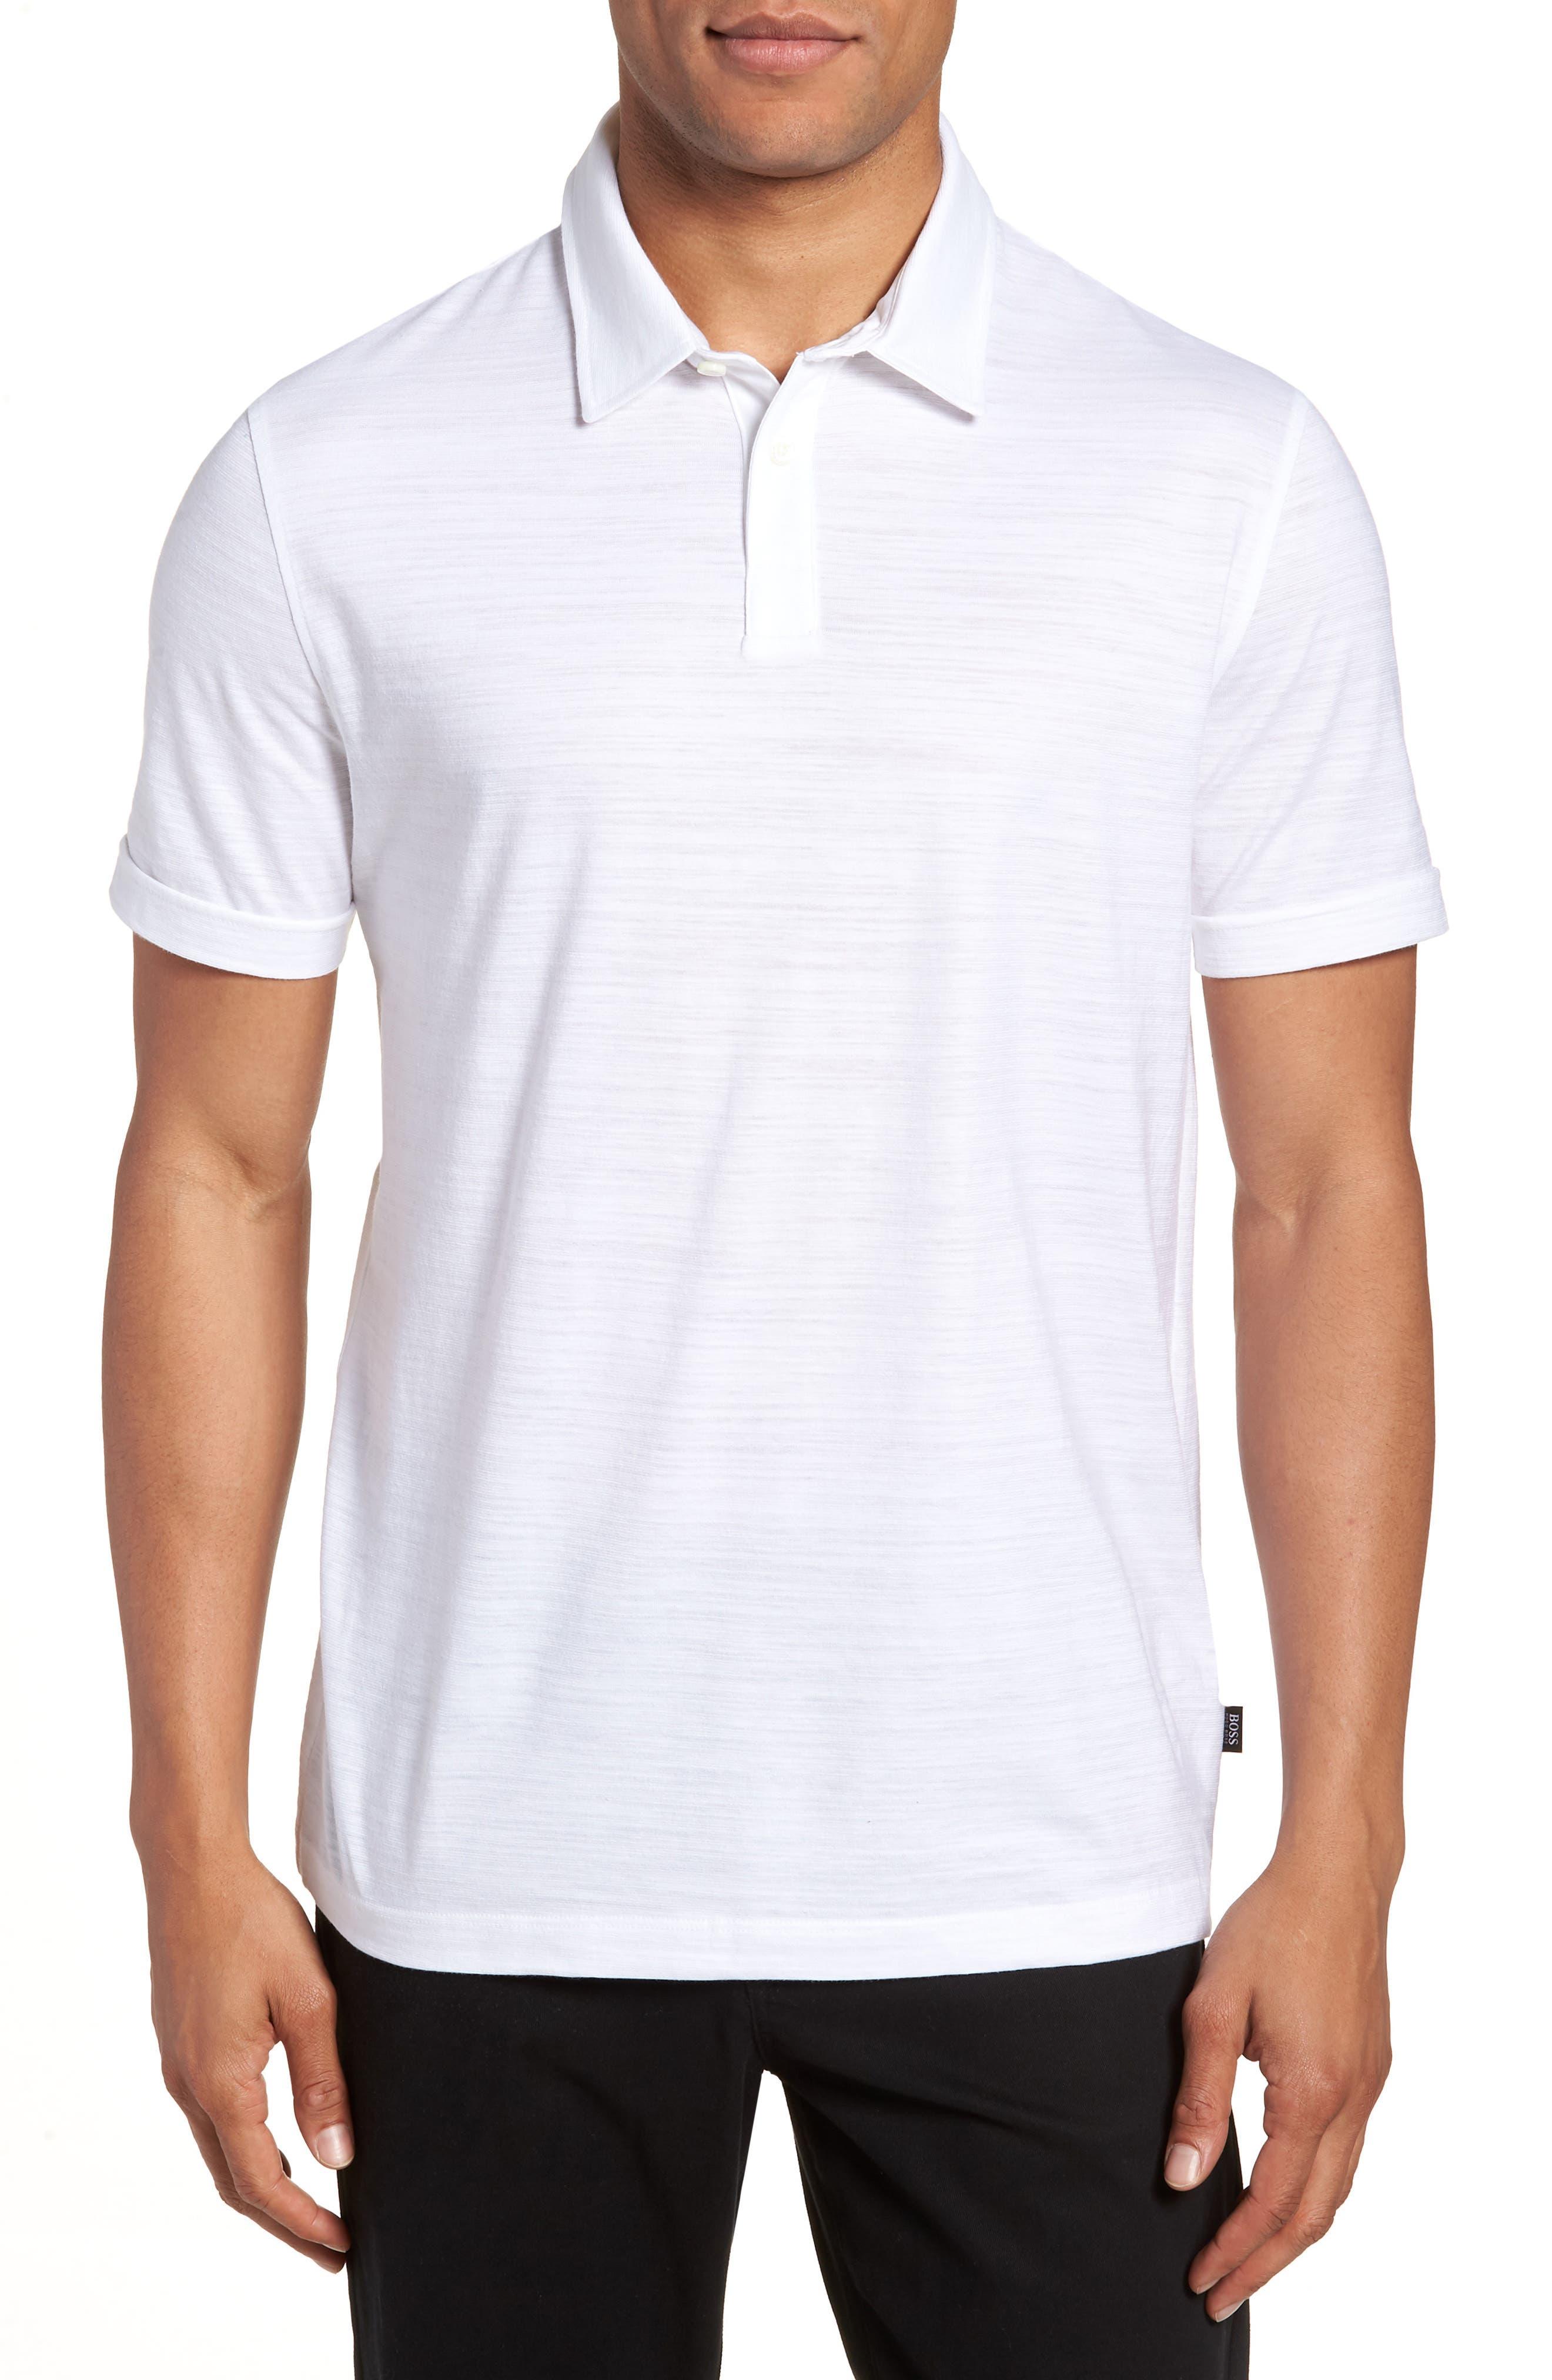 Alternate Image 1 Selected - BOSS Press Flame Slim Fit Polo Shirt